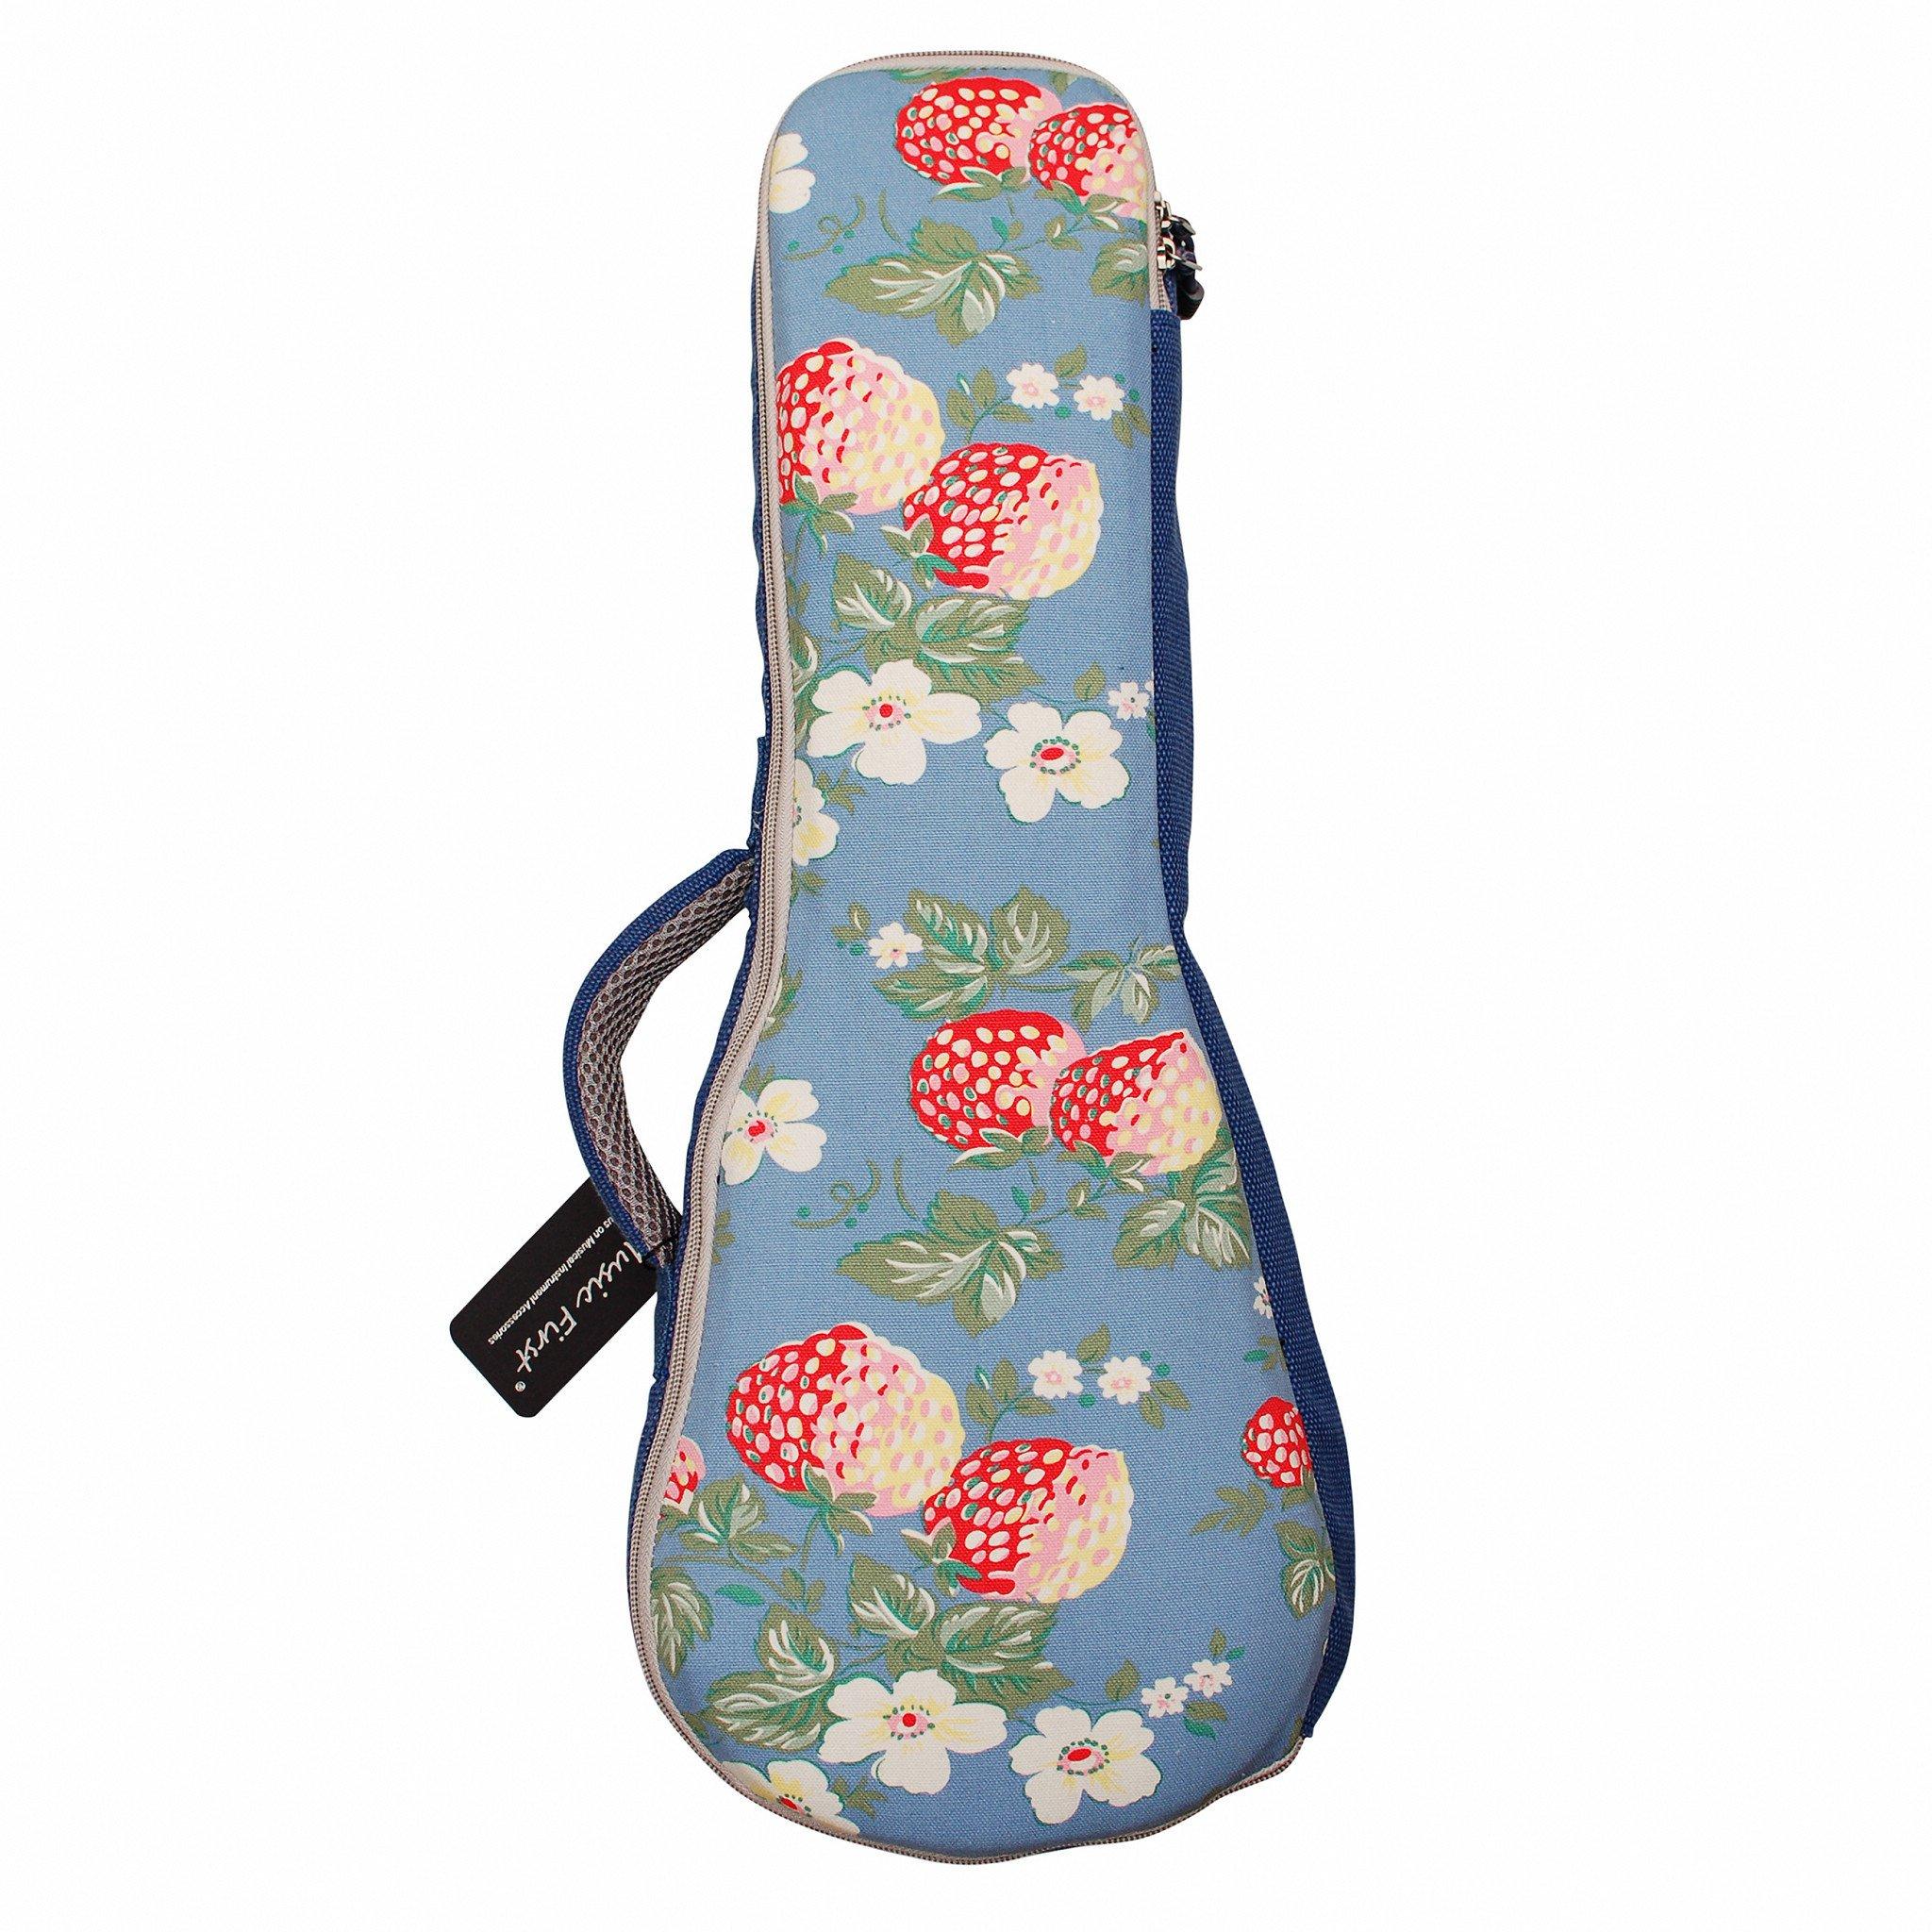 "MUSIC FIRST Cotton 23''/24'' Concert Vintage style ""Strawberry Flowers"", Ukulele Bag Ukulele Case Ukulele Cover, New Arrial, Original Design (23/24 inch Concert, Strawberry Flowers)"